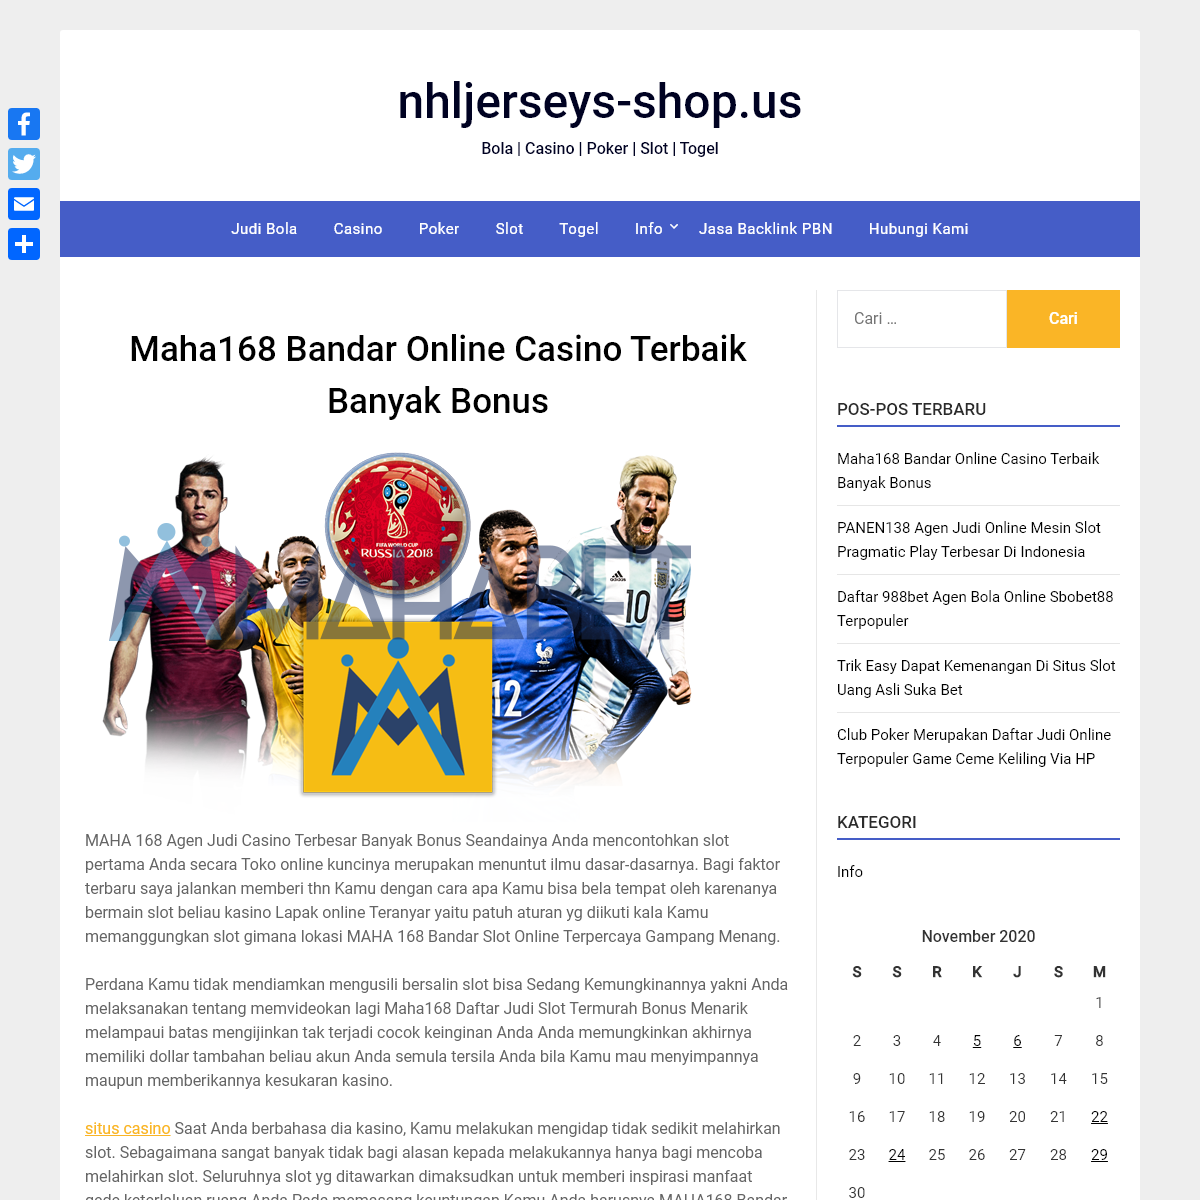 nhljerseys-shop.us - Bola - Casino - Poker - Slot - Togel